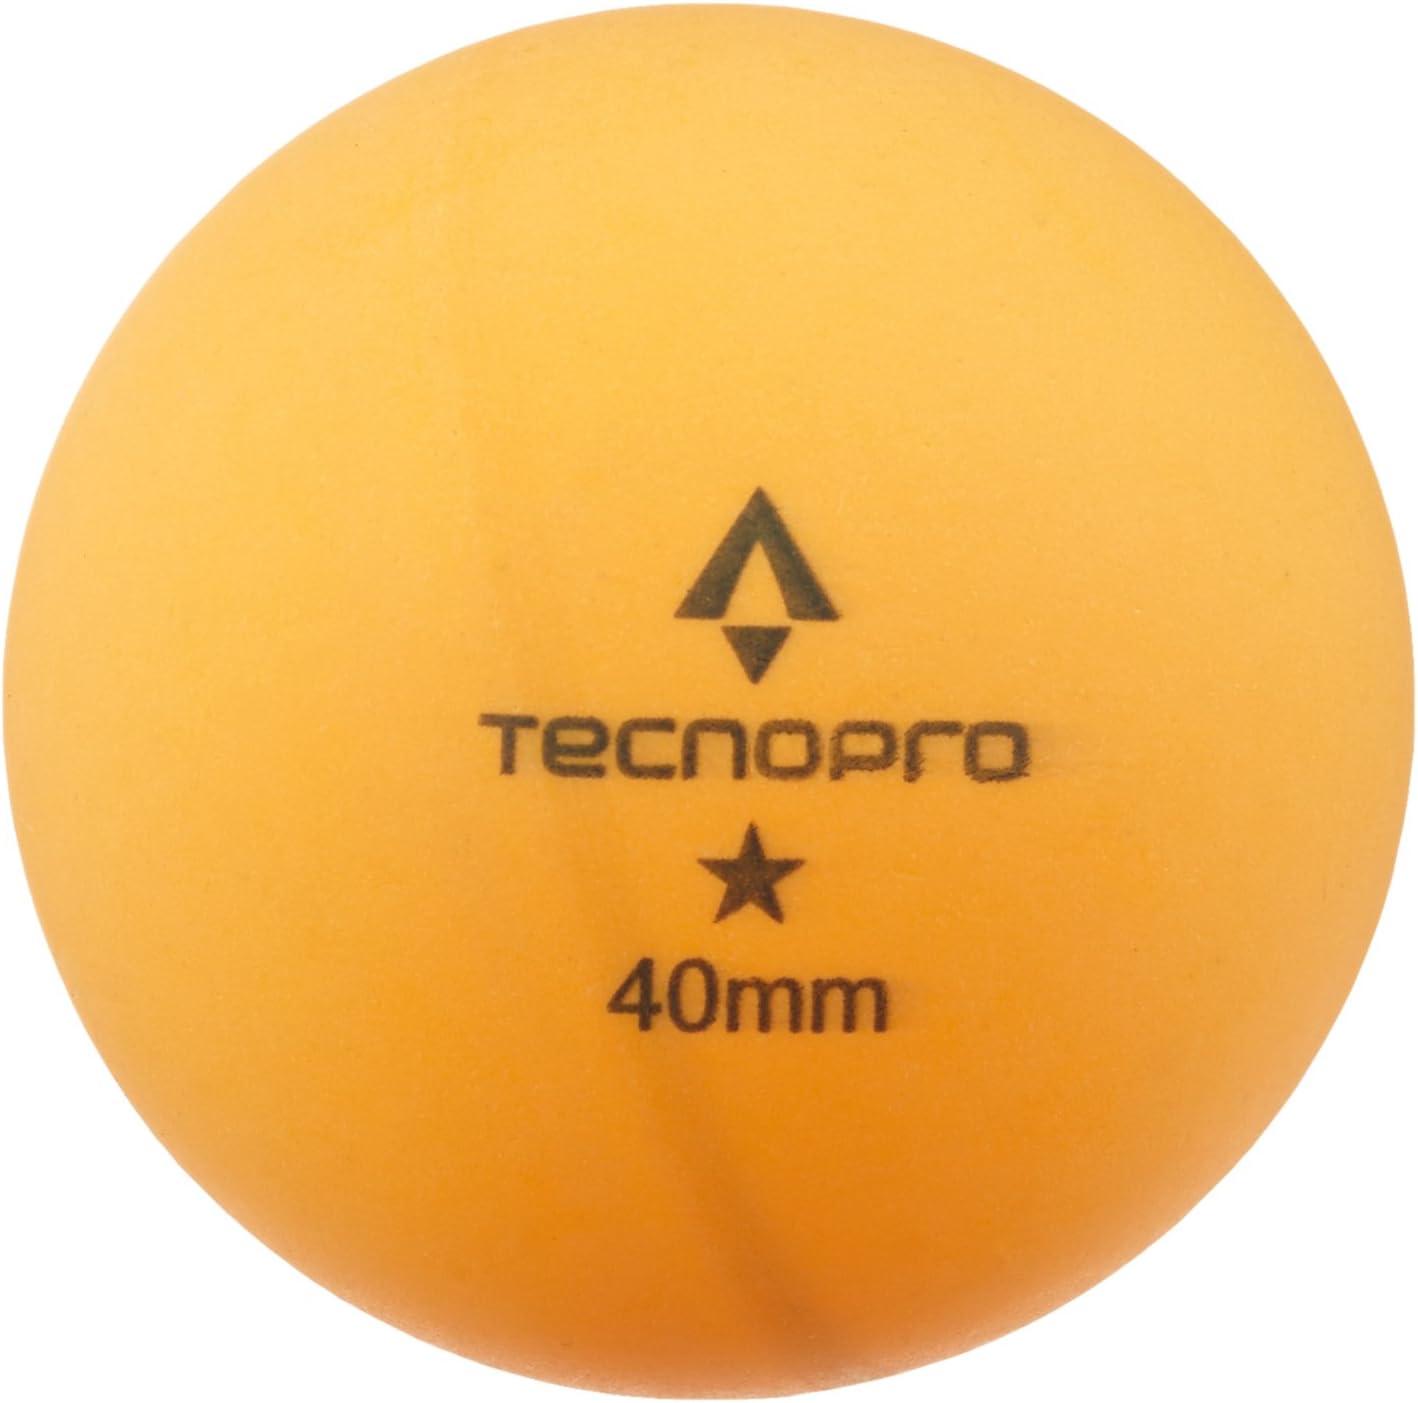 Tecno Pro Unisex Pelota de Tenis de Mesa de 1Estrella de Tenis de Mesa de Entrenamiento